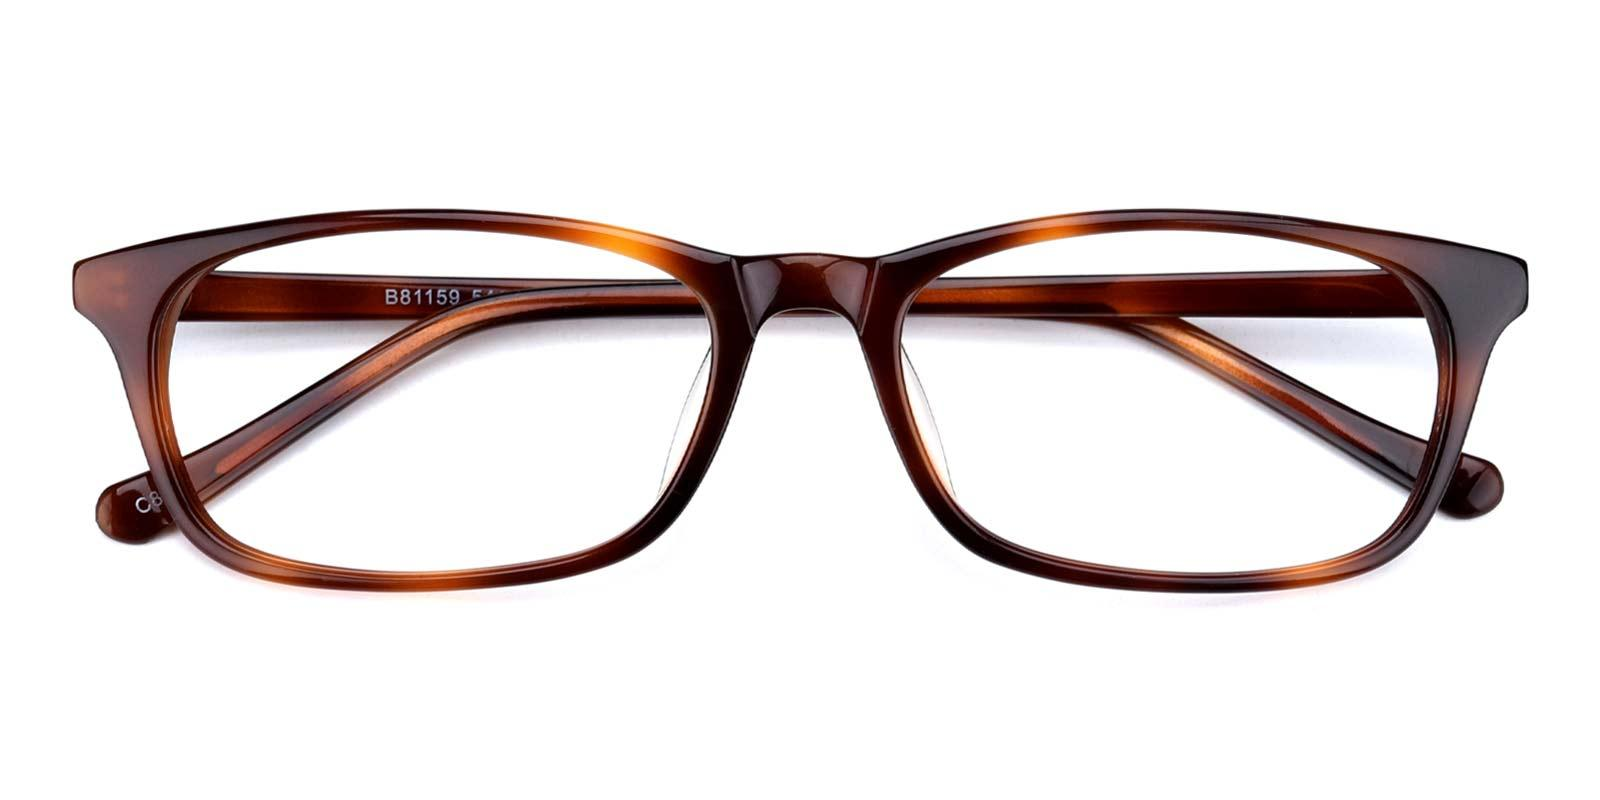 Taffy-Tortoise-Rectangle-Acetate-Eyeglasses-detail